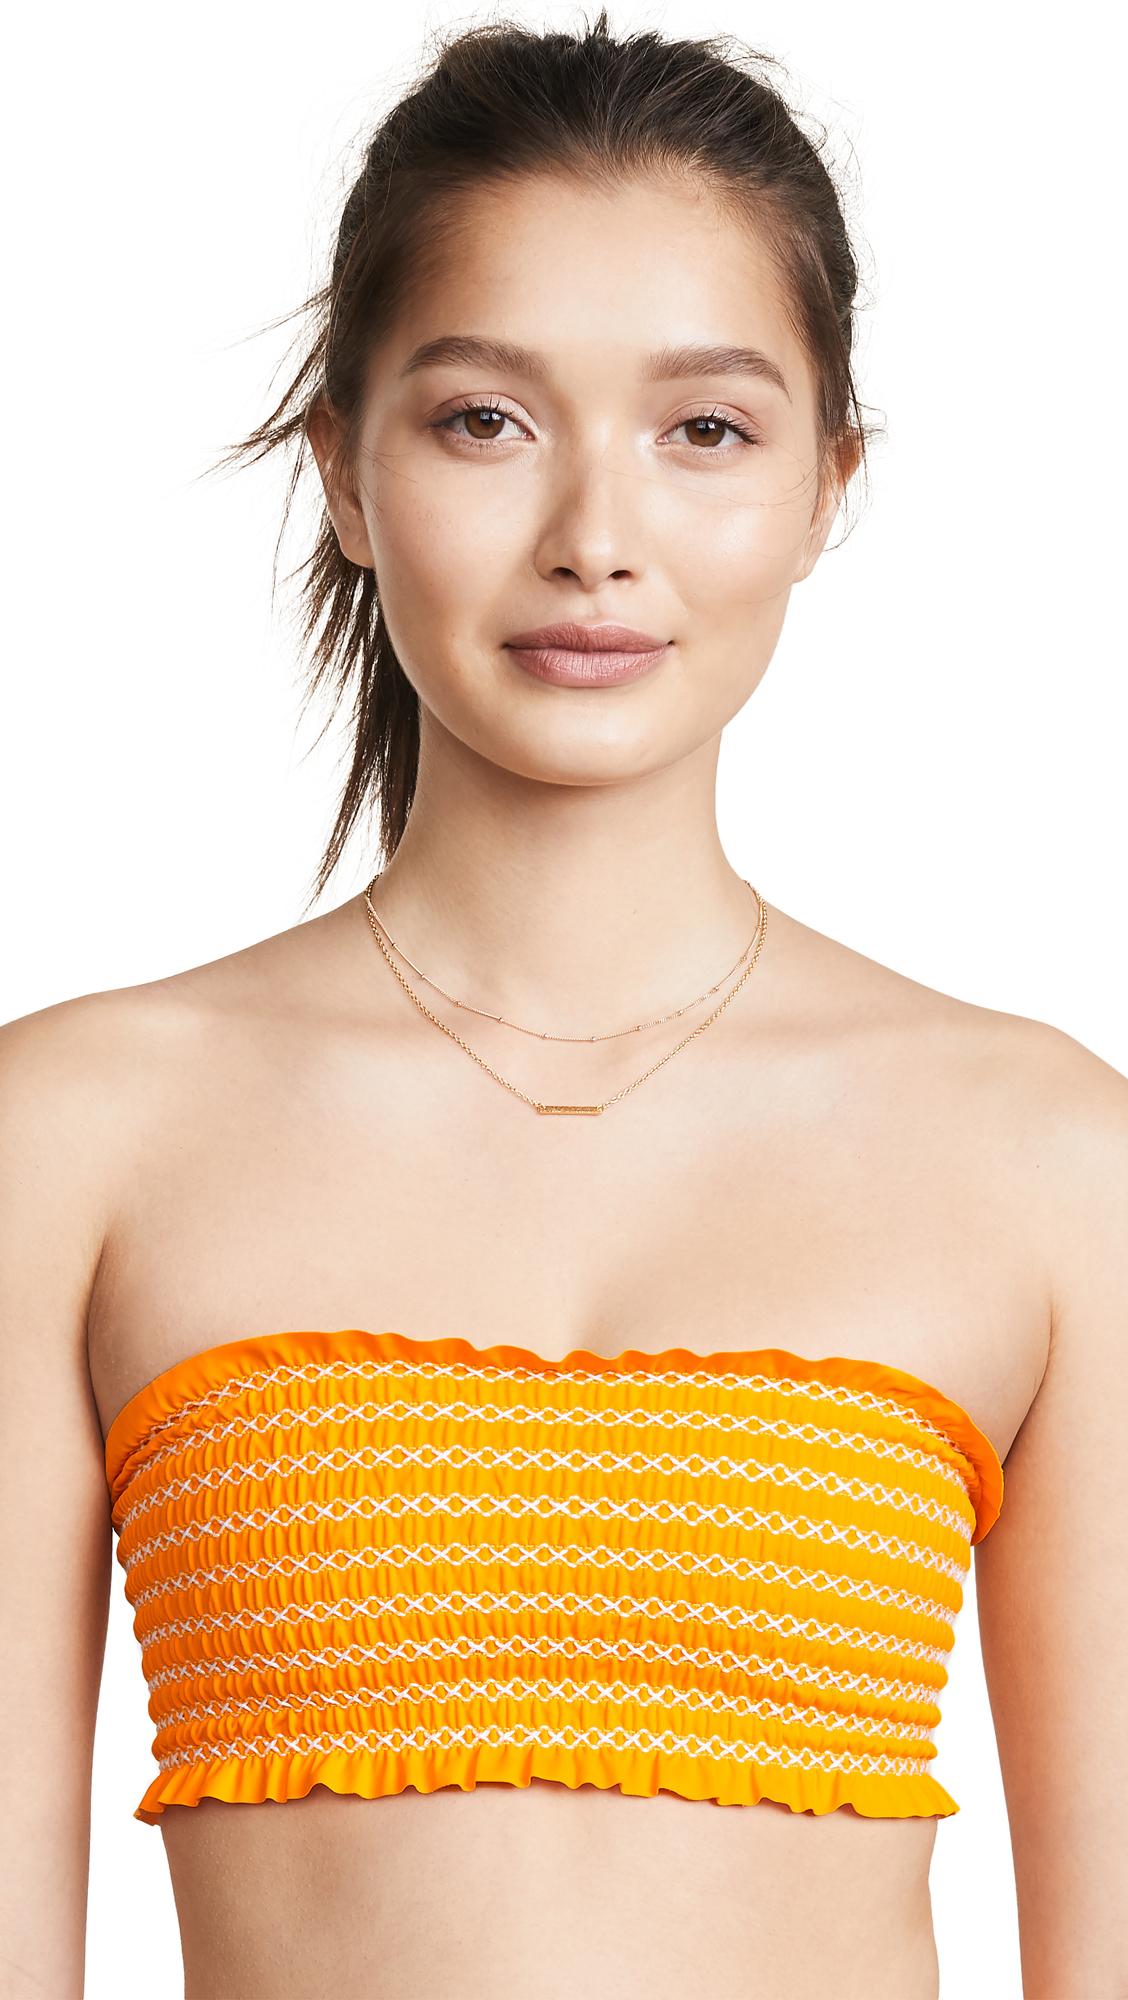 ELLEJAY Chelsea Bikini Top in Orange